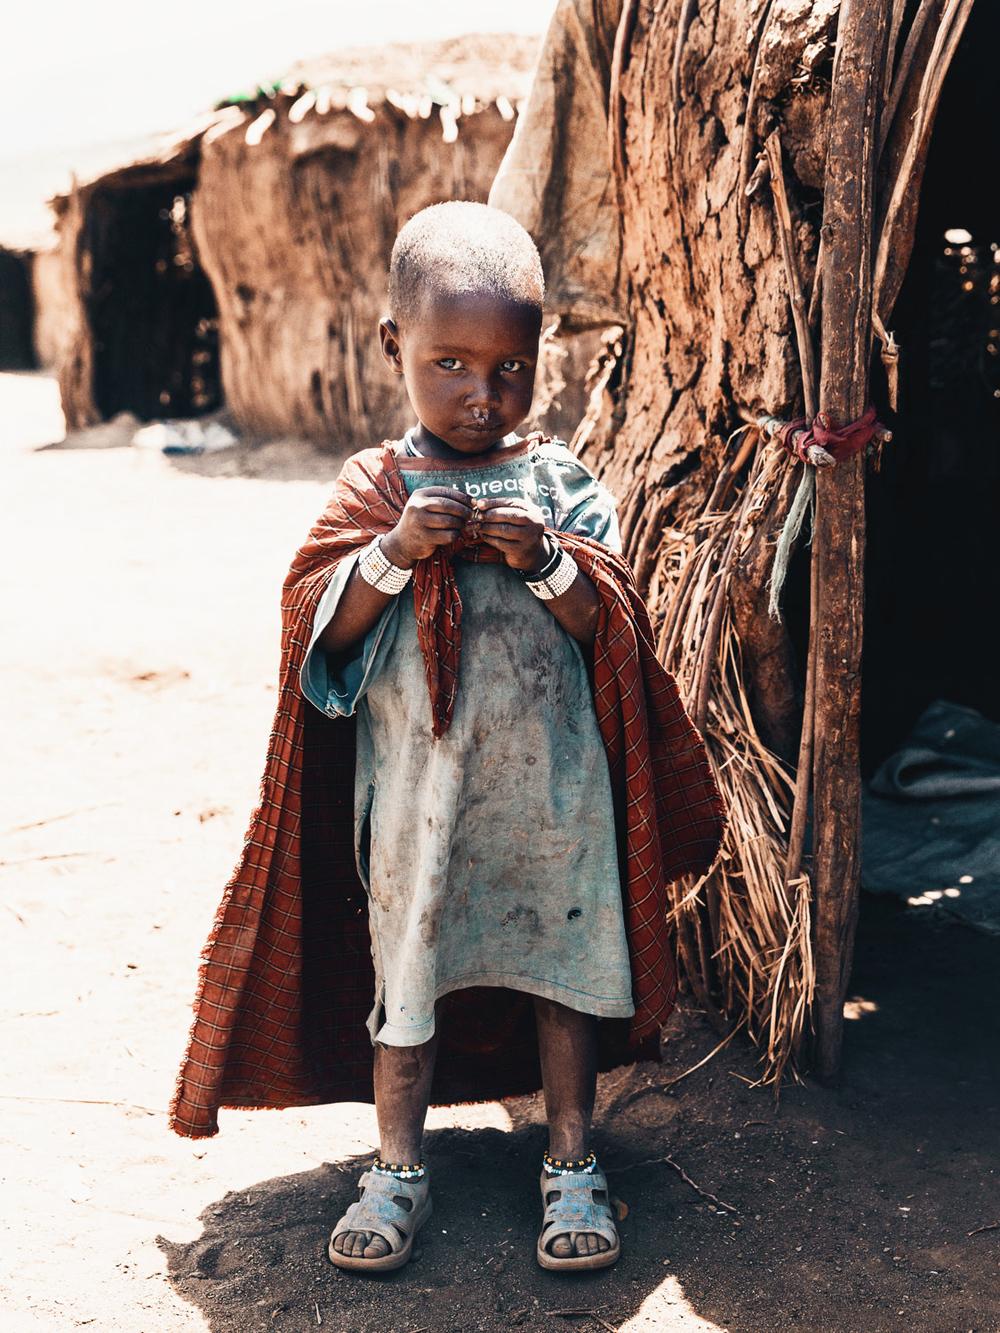 CallieGiovanna_Africa_Tanzania_MalangaVillage_20150101_07404.jpg